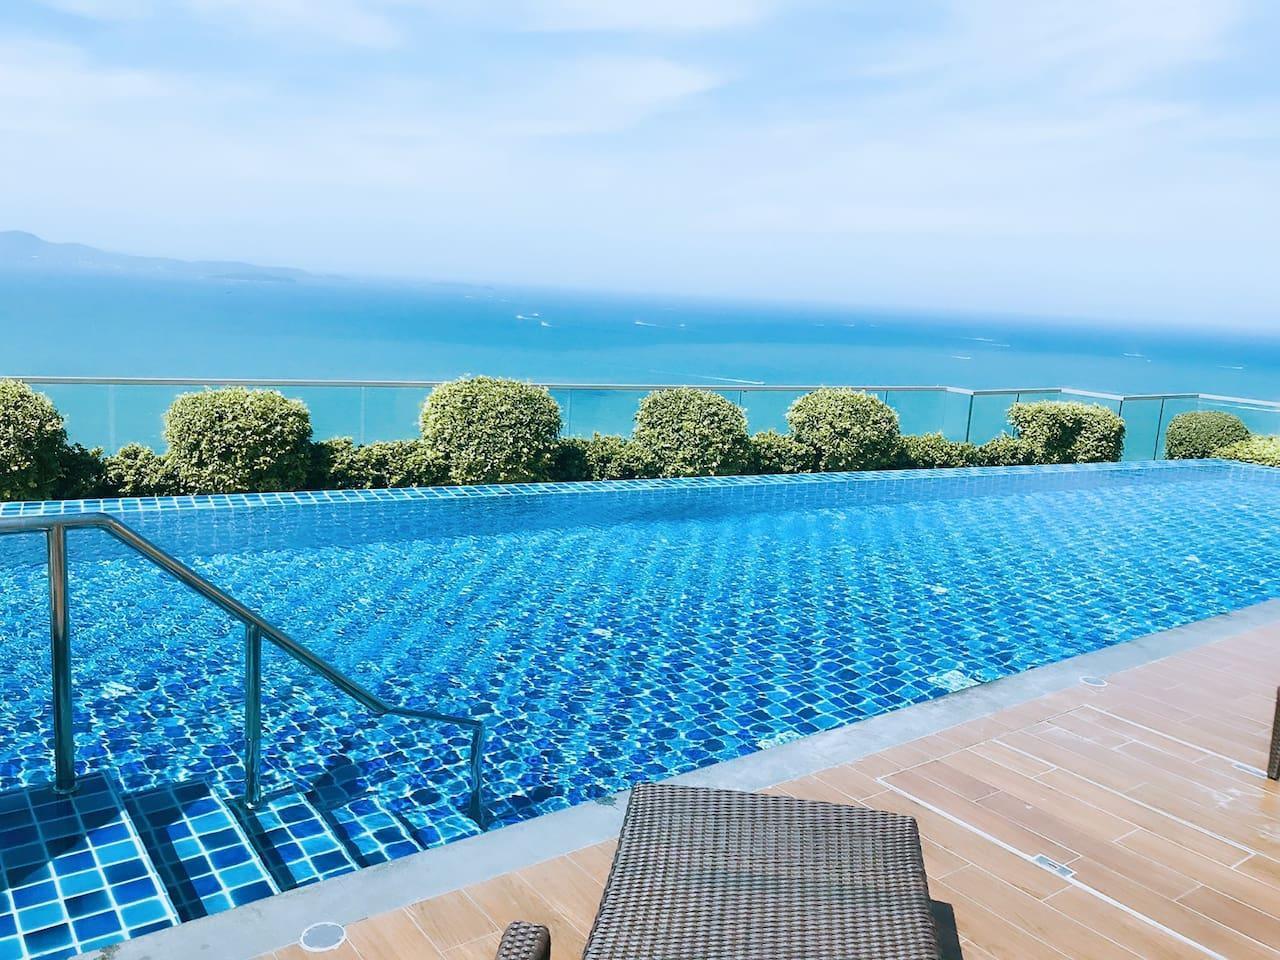 D15 outstanding Pattaya city view with sky pool อพาร์ตเมนต์ 1 ห้องนอน 1 ห้องน้ำส่วนตัว ขนาด 31 ตร.ม. – เขาพระตำหนัก